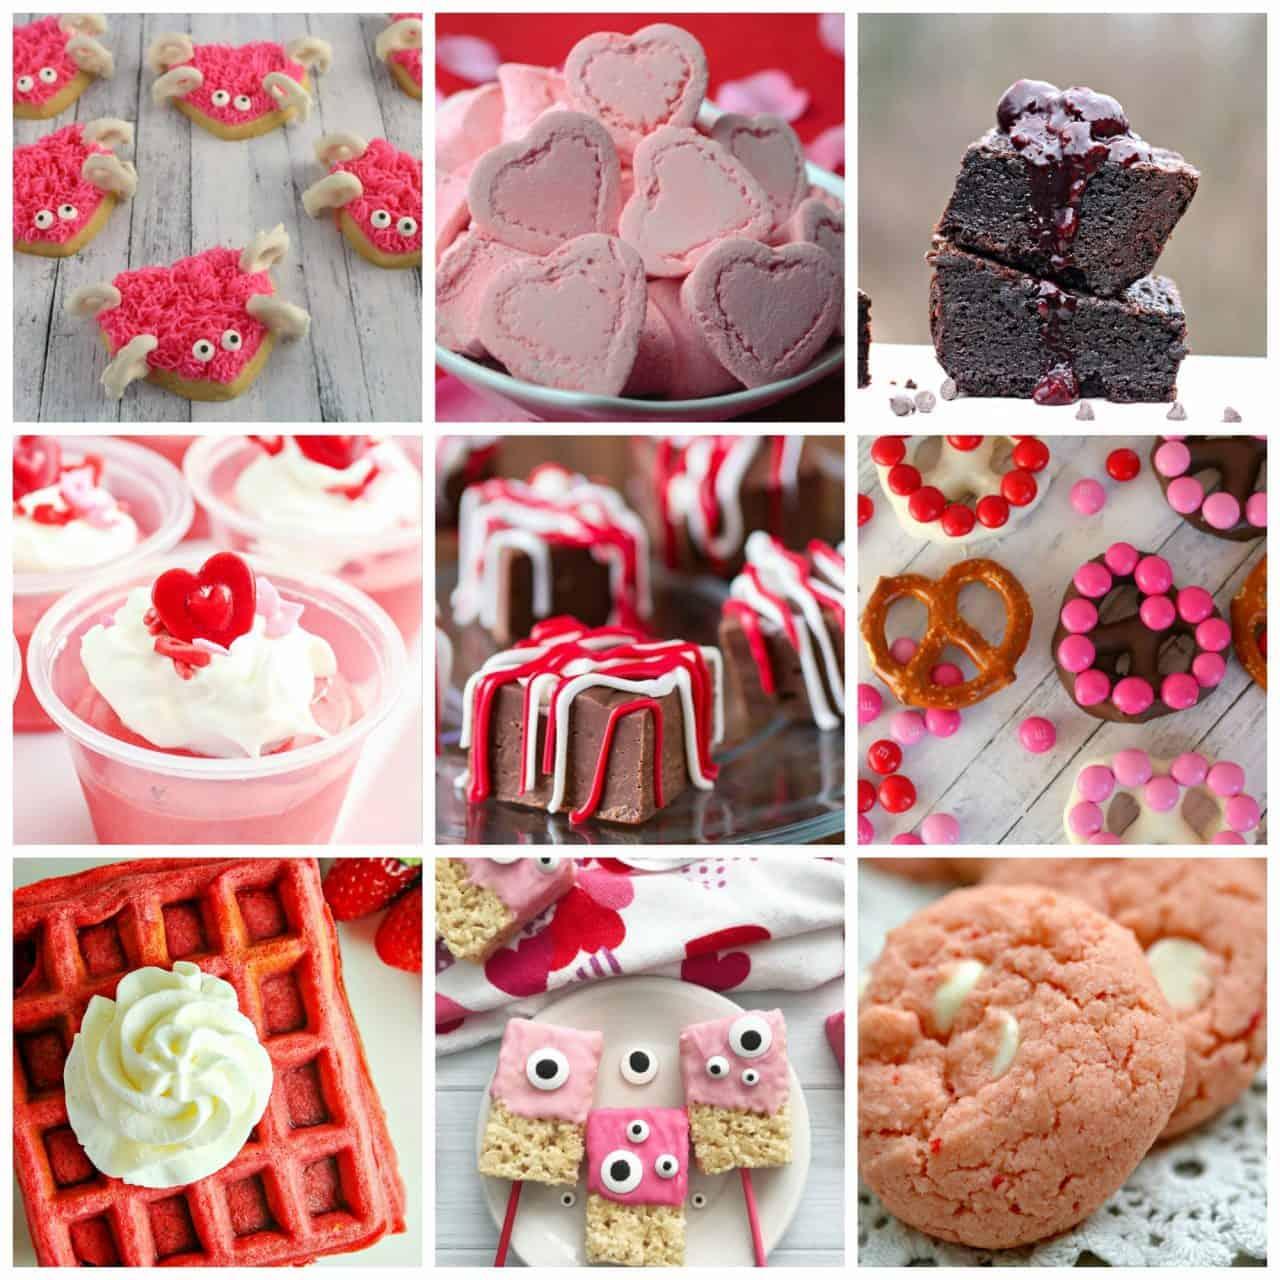 9 square collage of Valentine's Day Desserts